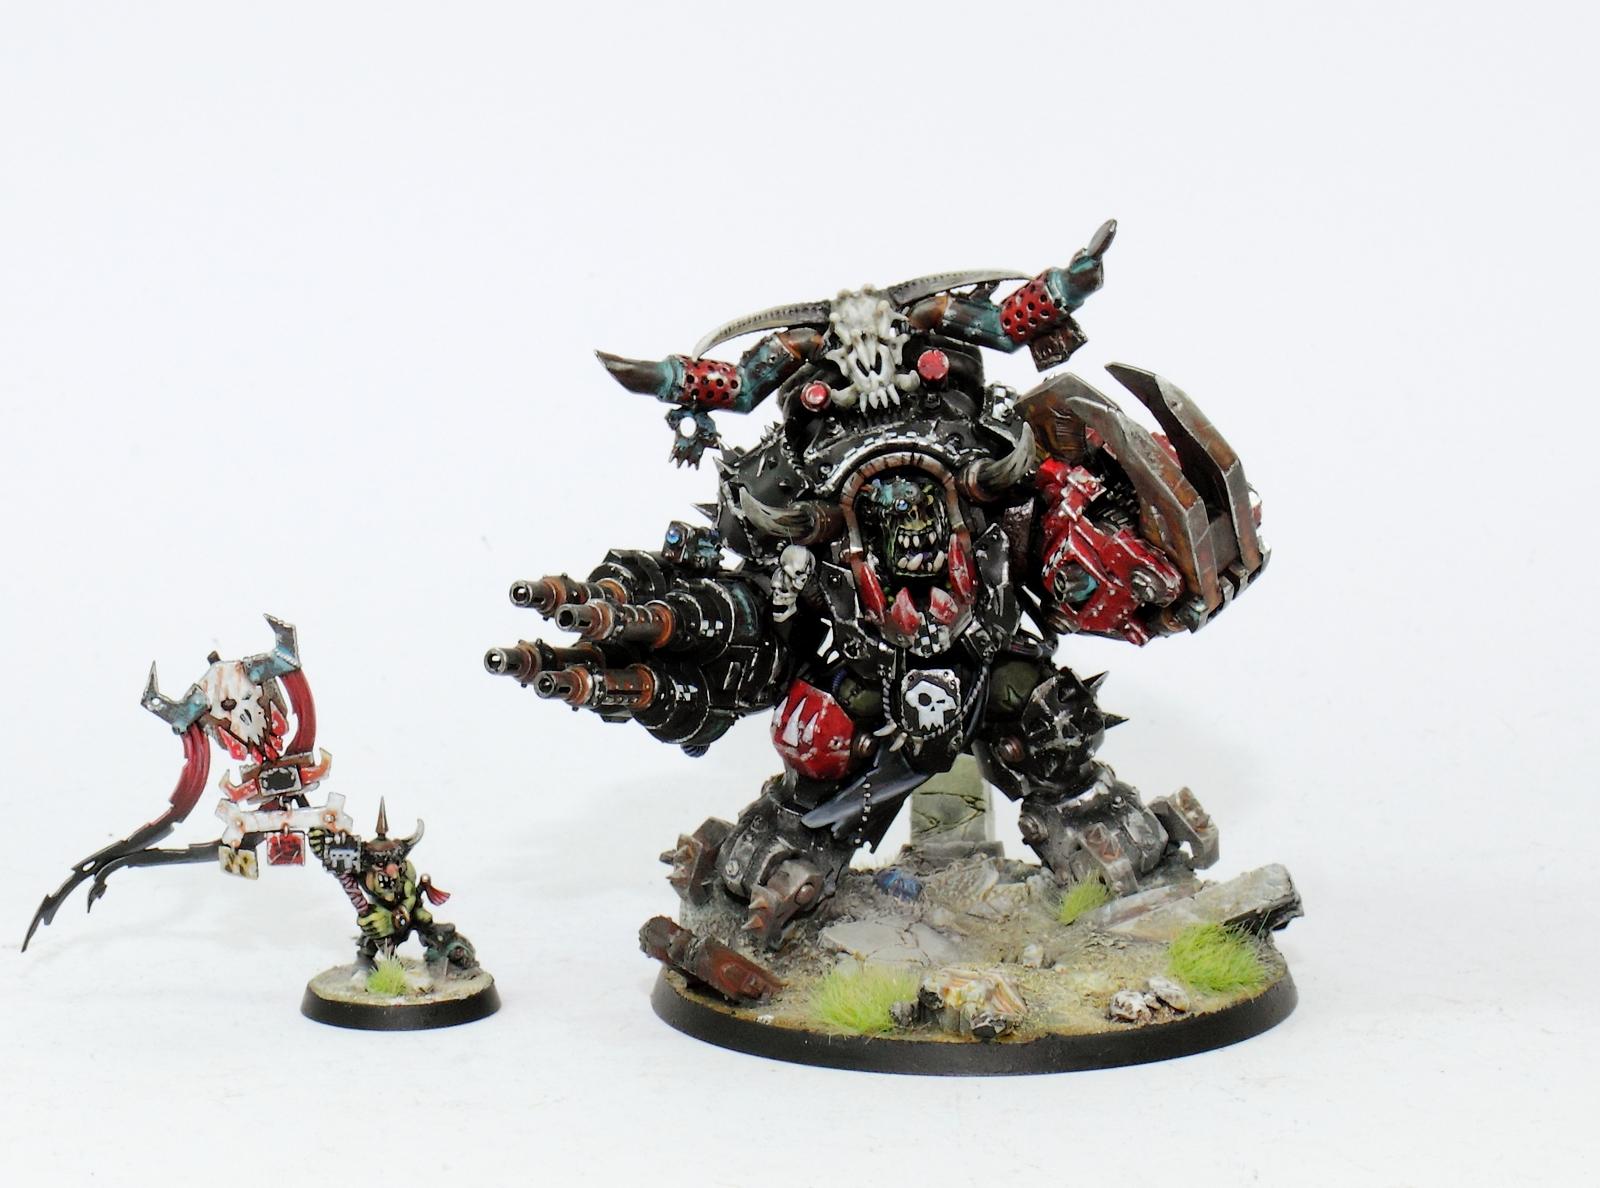 In Hand Makari Warhammer 40k Orks Ghazghkull Thraka